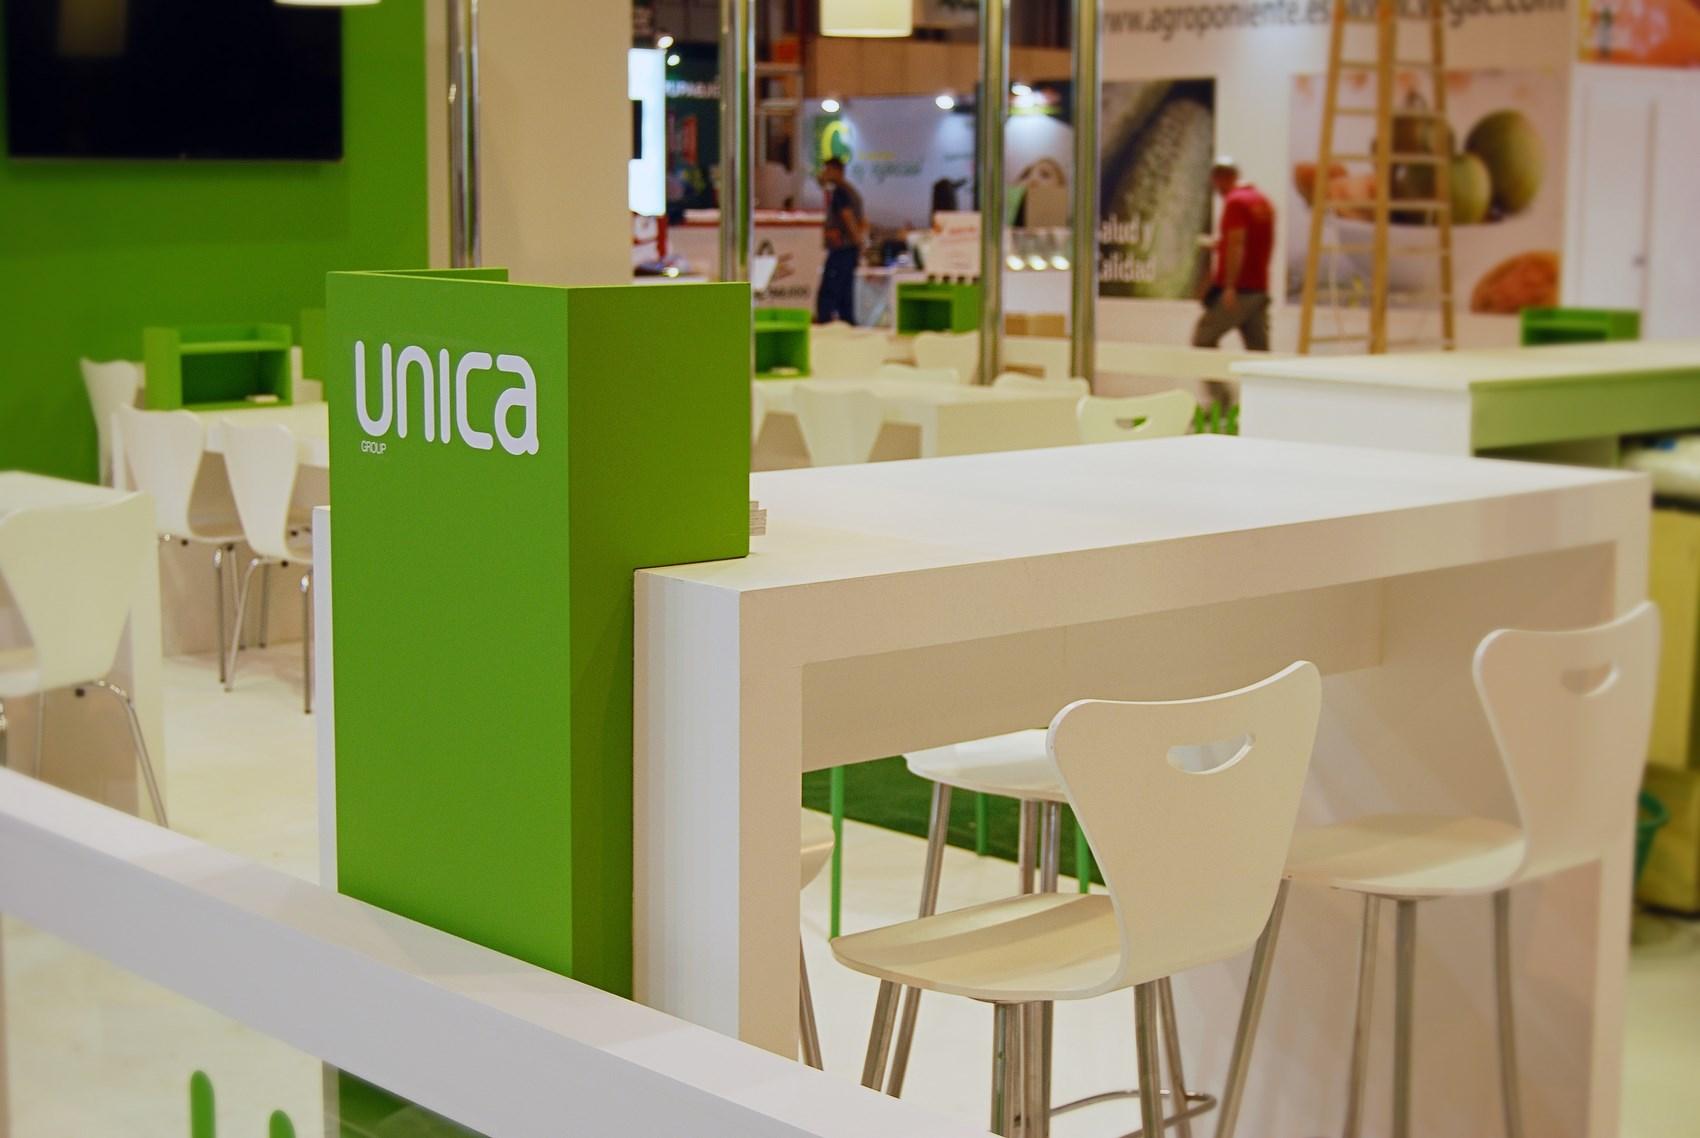 unica (1)